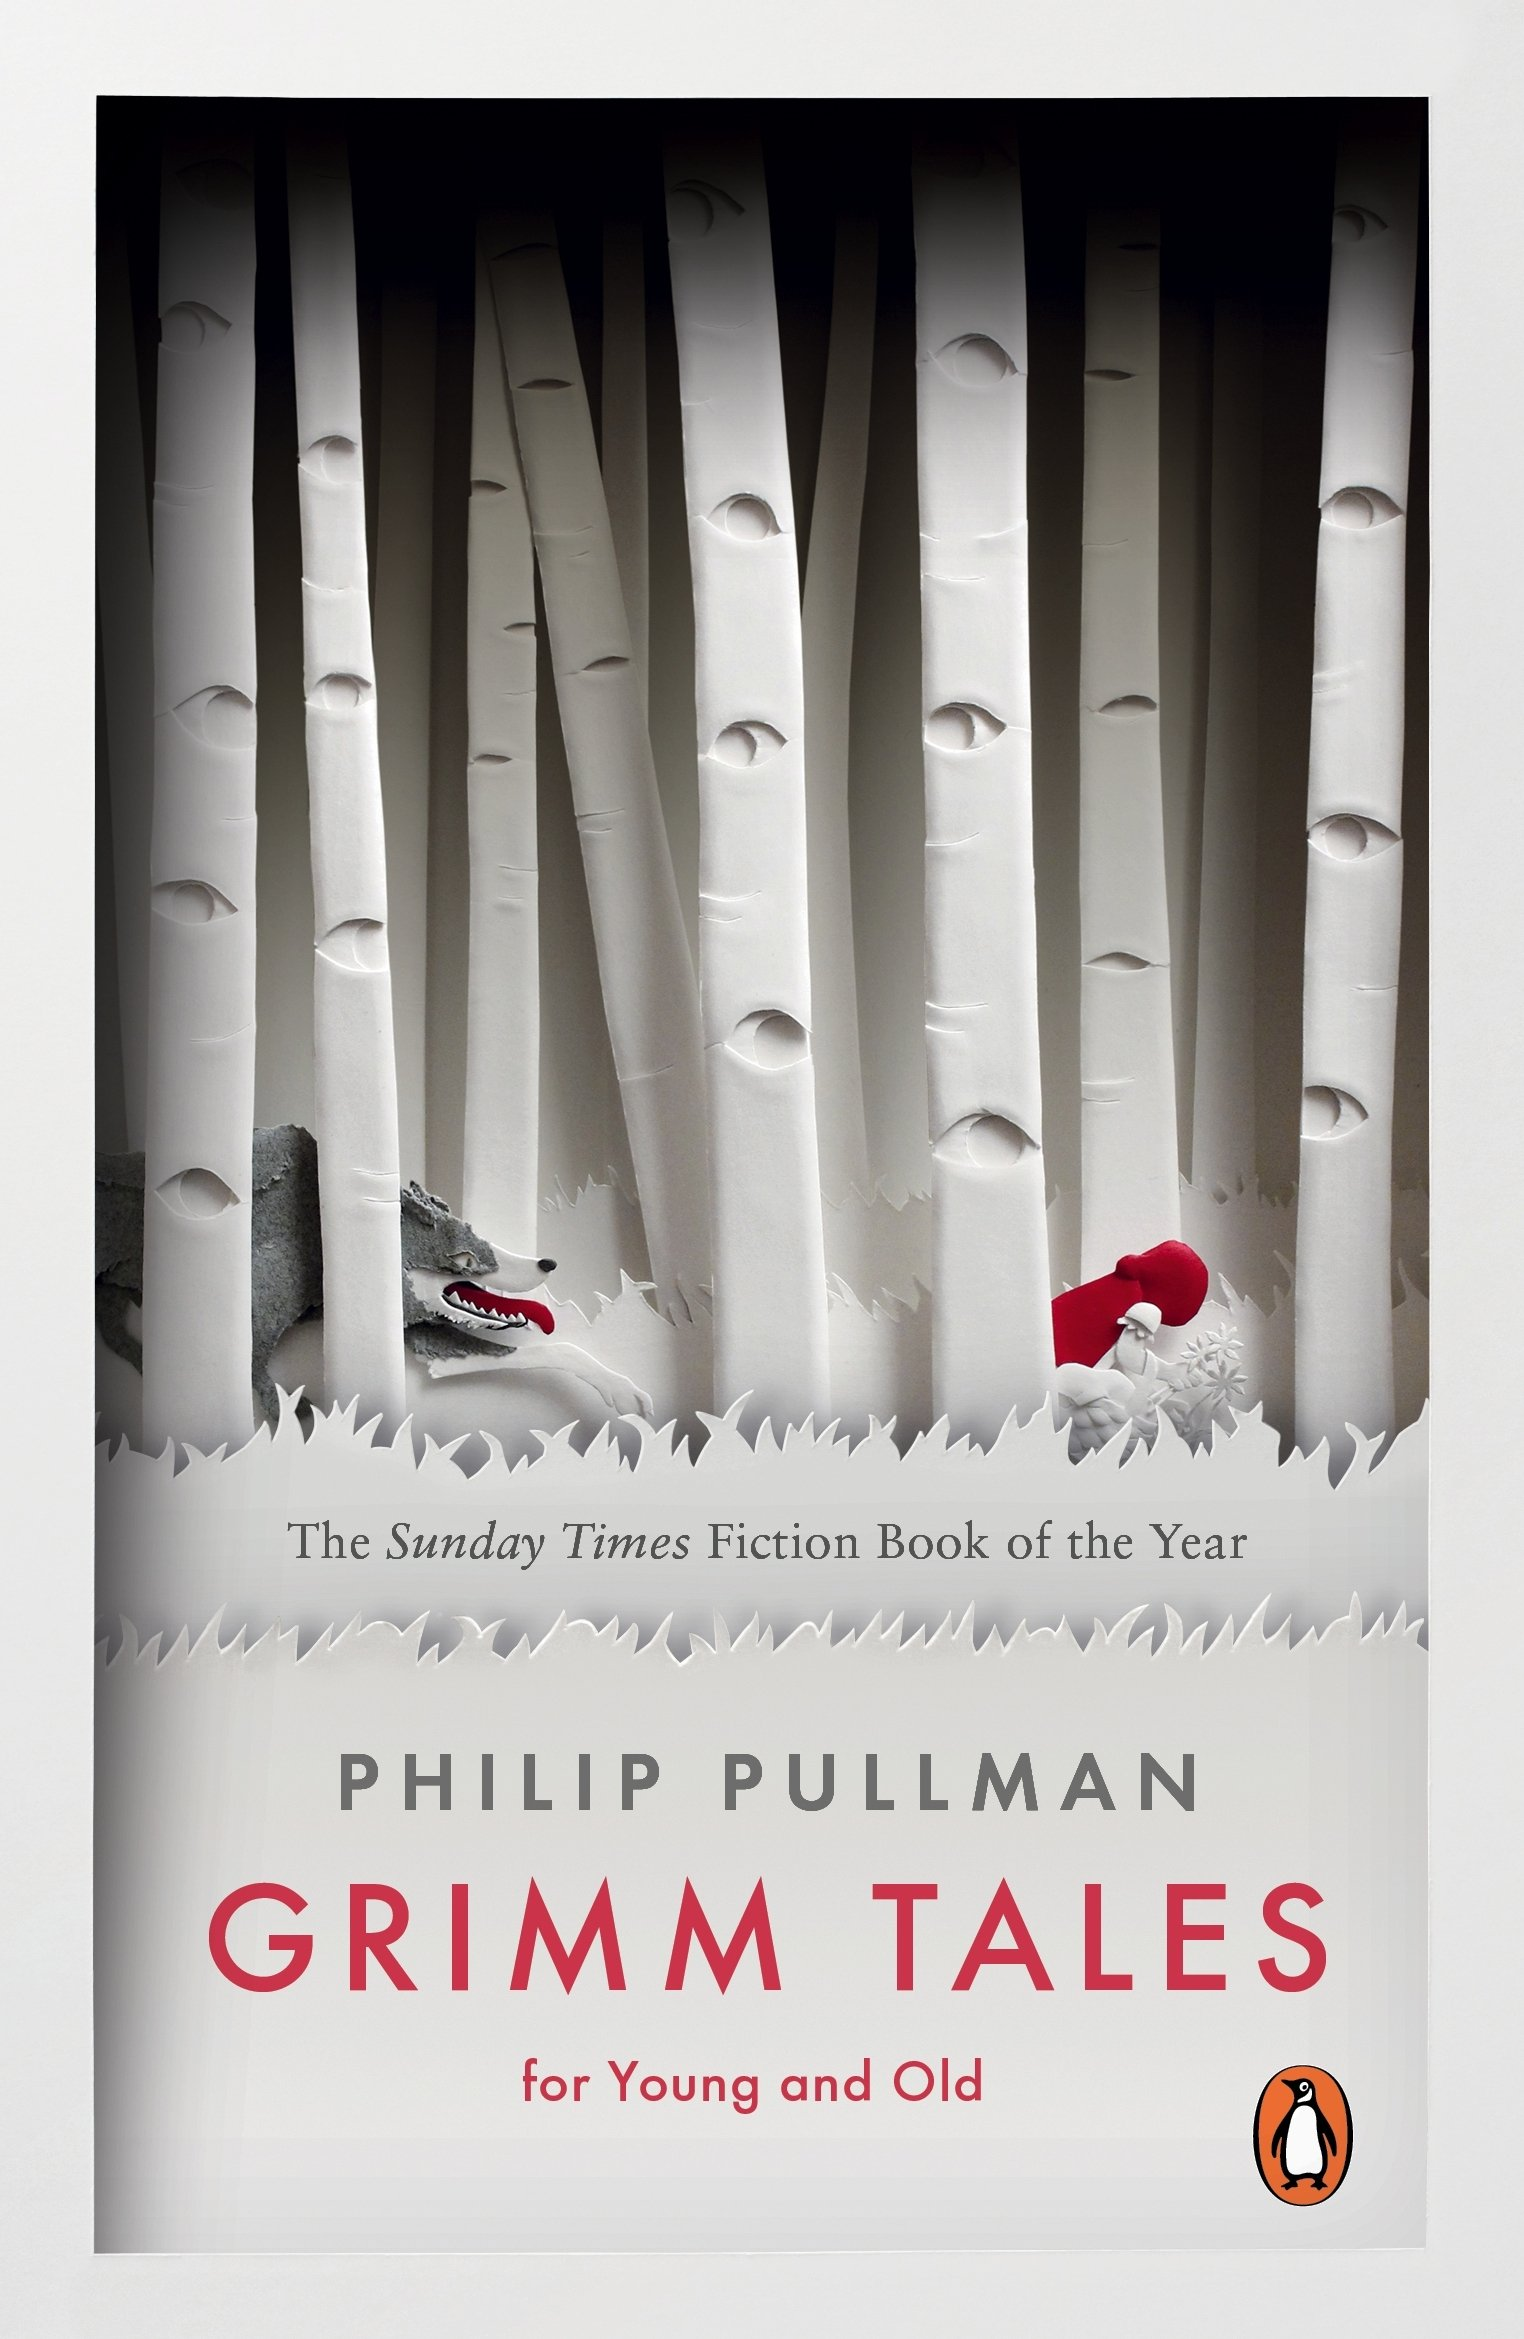 Philip Pullman - The Grimm Tales (Penguin)